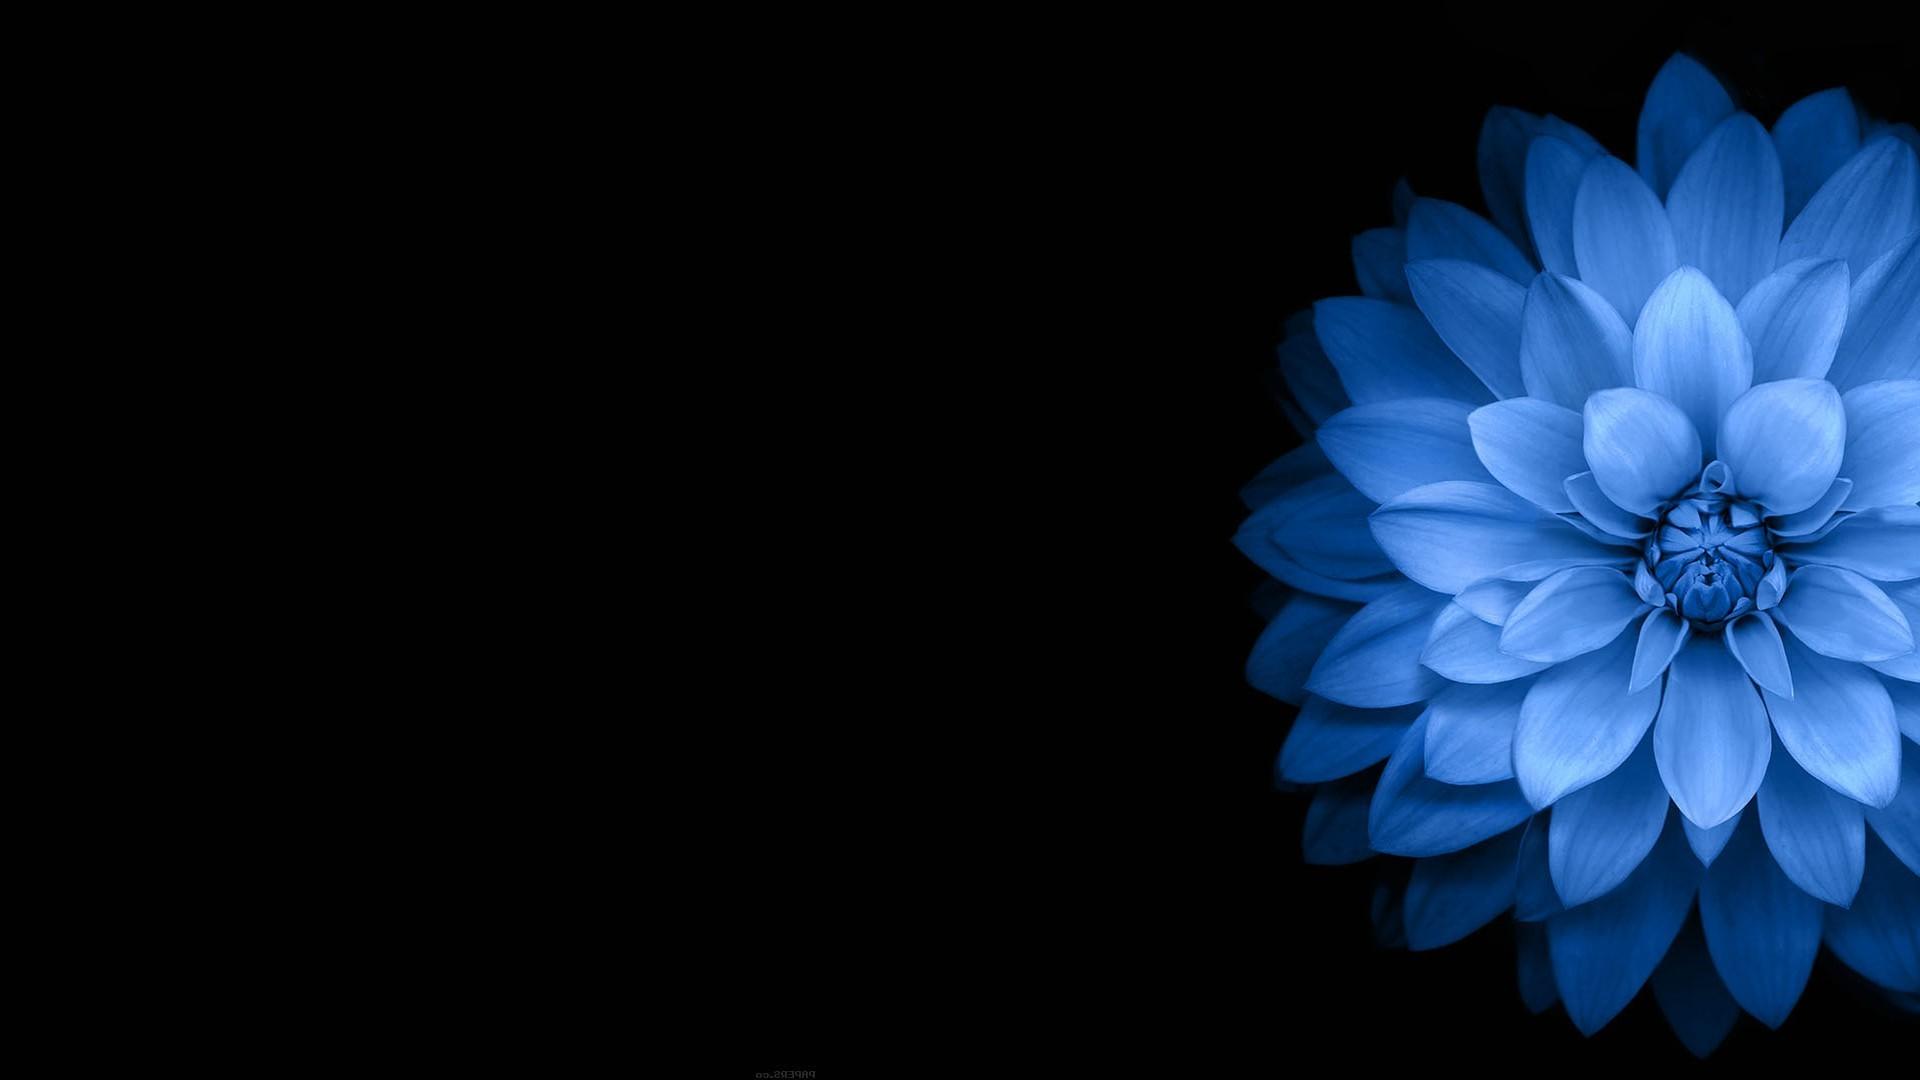 Dark Blue And White Flowers: Dark Flower Wallpaper ·① WallpaperTag